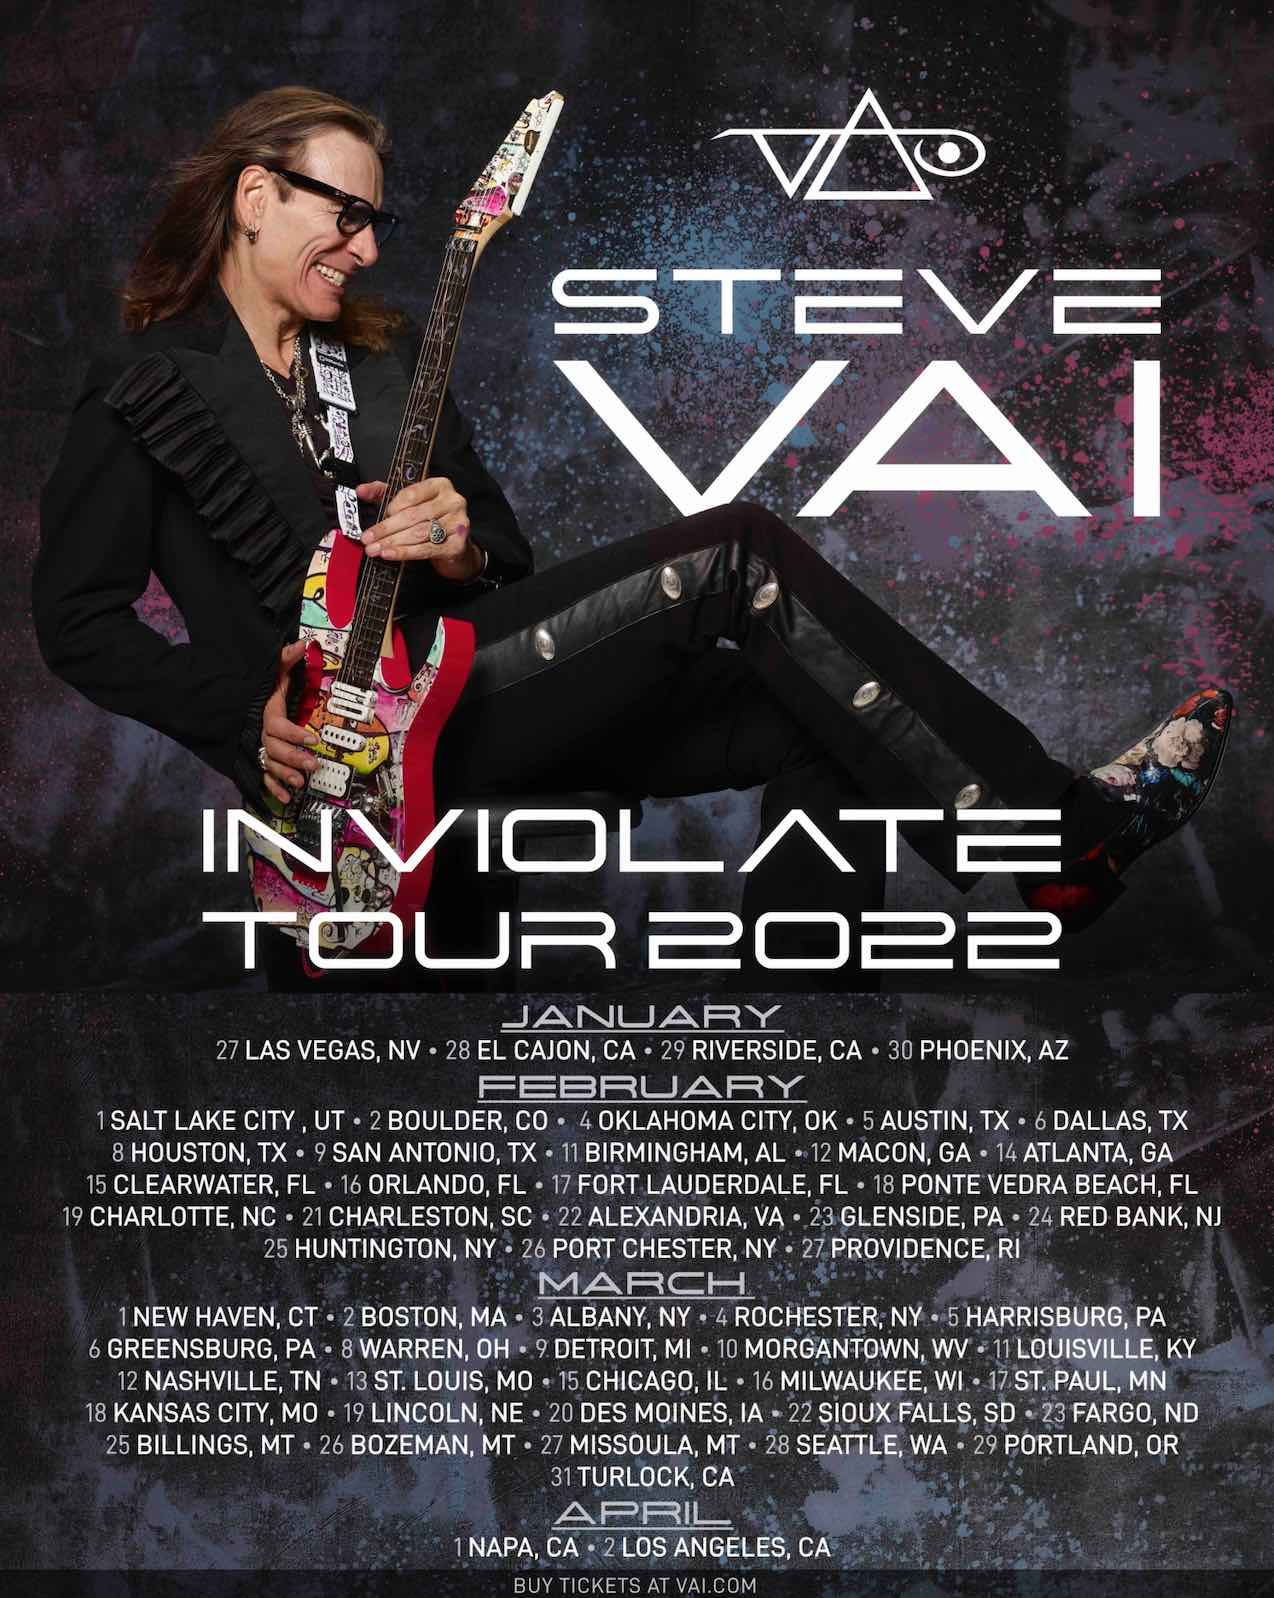 Steve Vai Announces 2022 U.S. Tour - New Music Coming